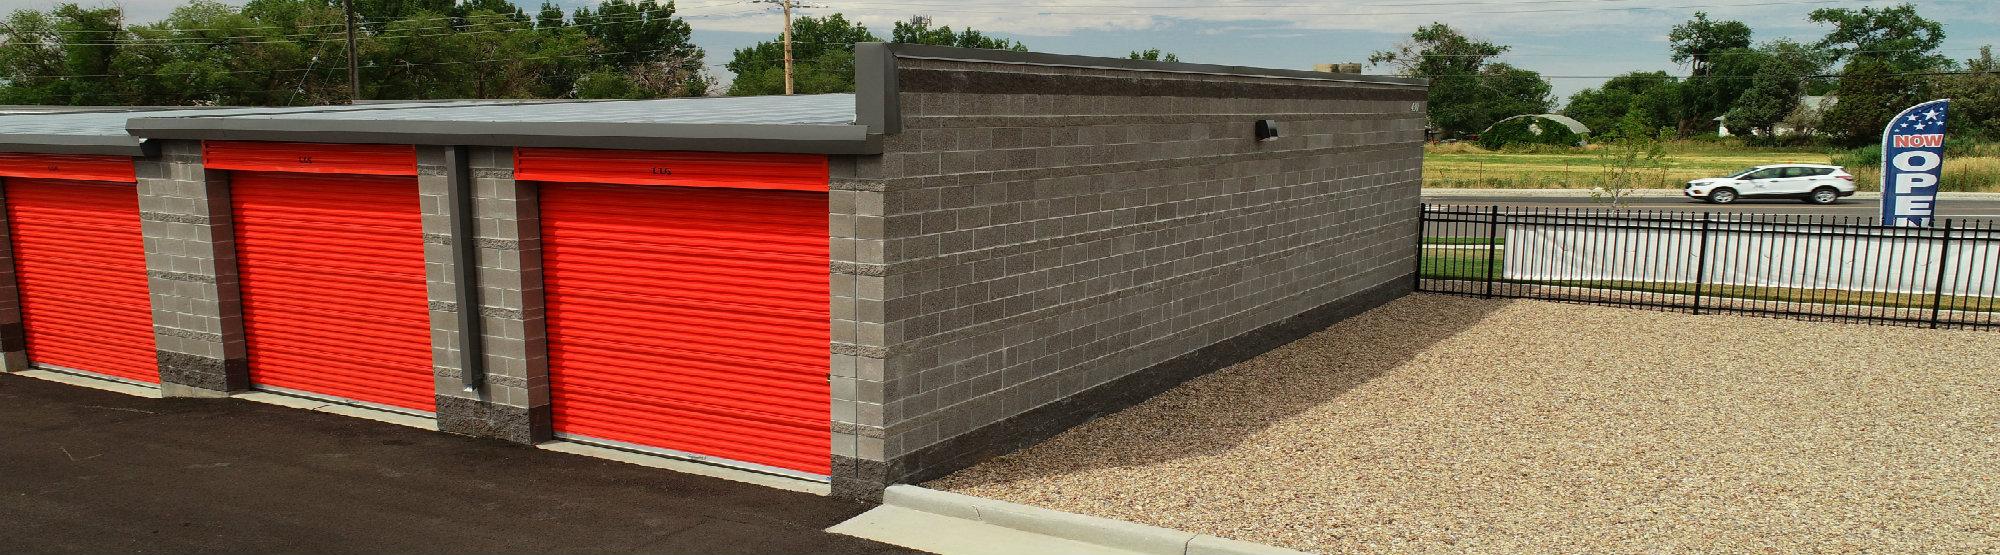 roll-up door access to units layton, ut